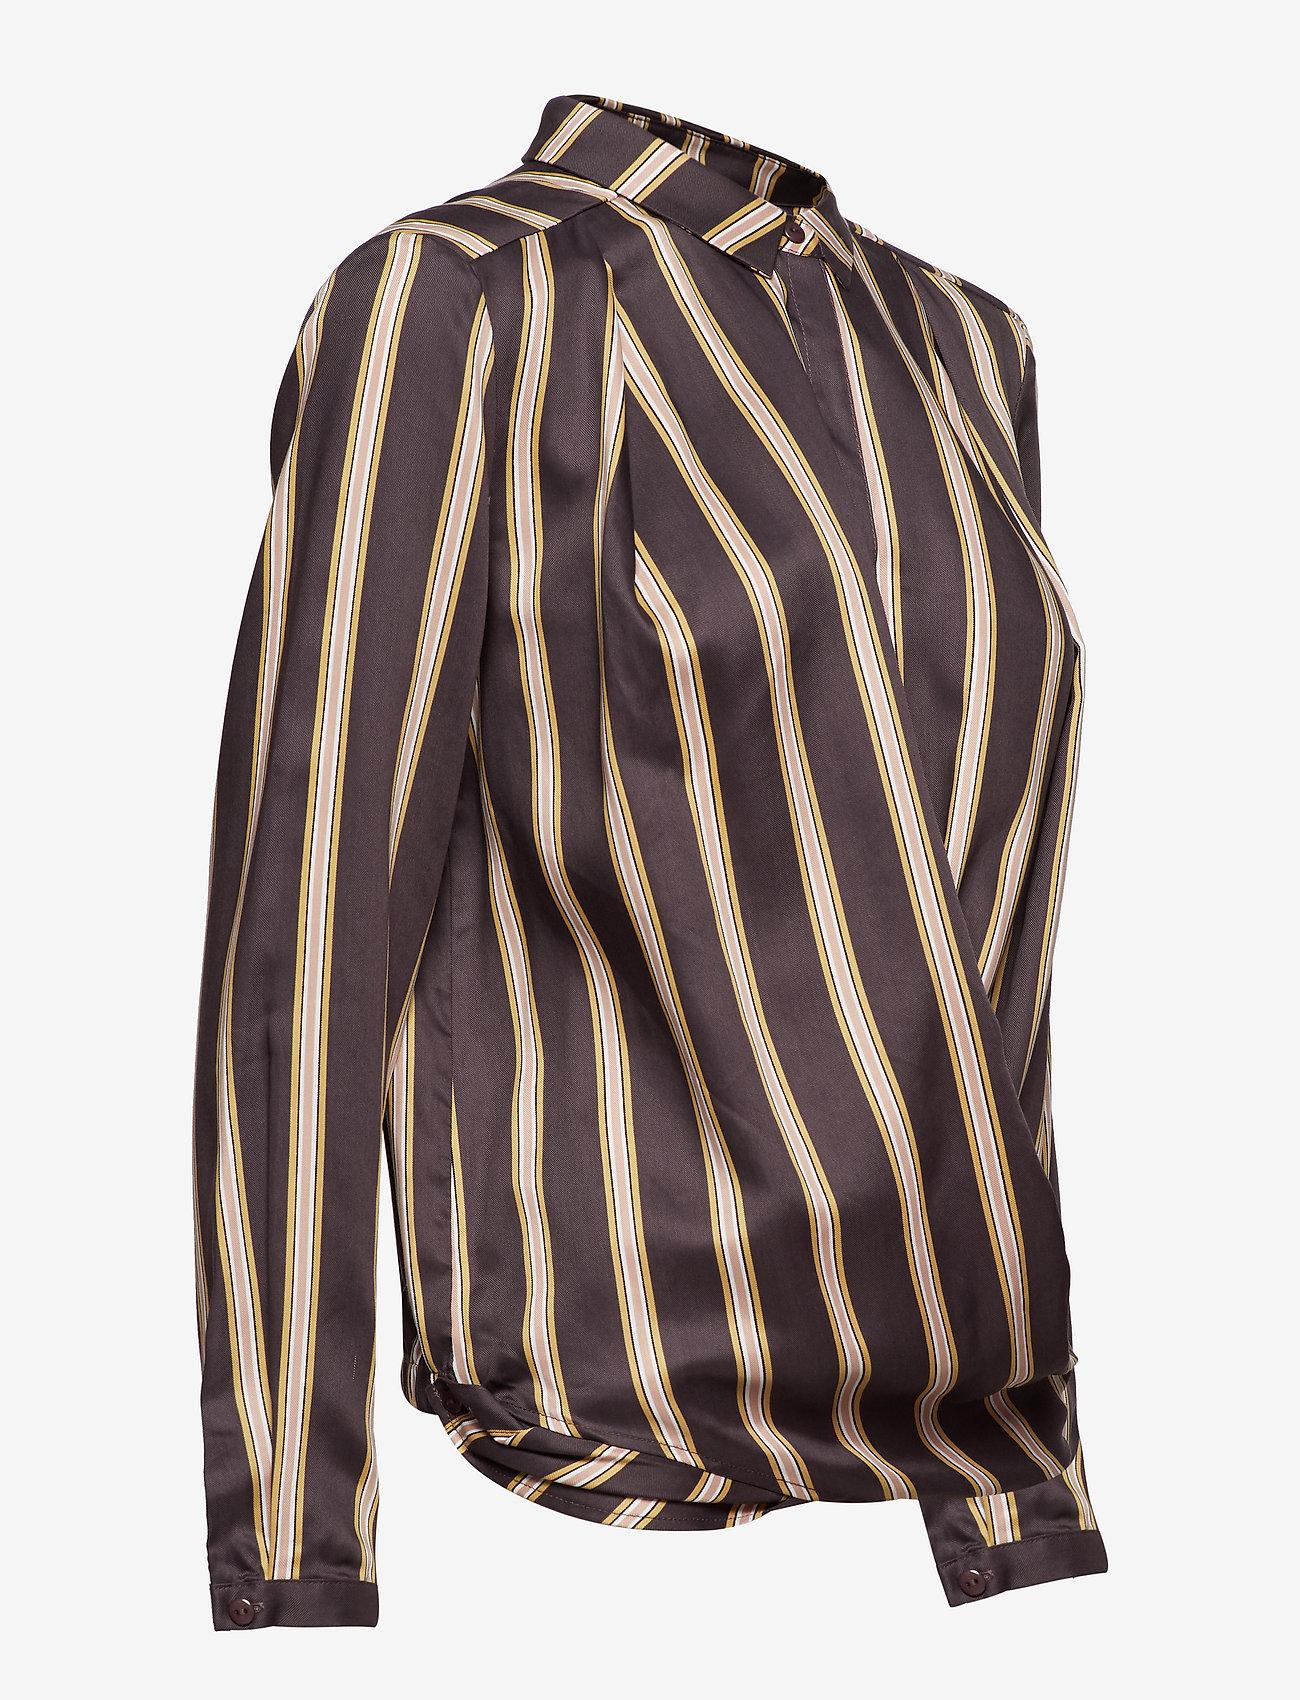 Shirt In Jacquard Stripes W. Button (Grey Plum Stripe) (519.60 kr) - Coster Copenhagen